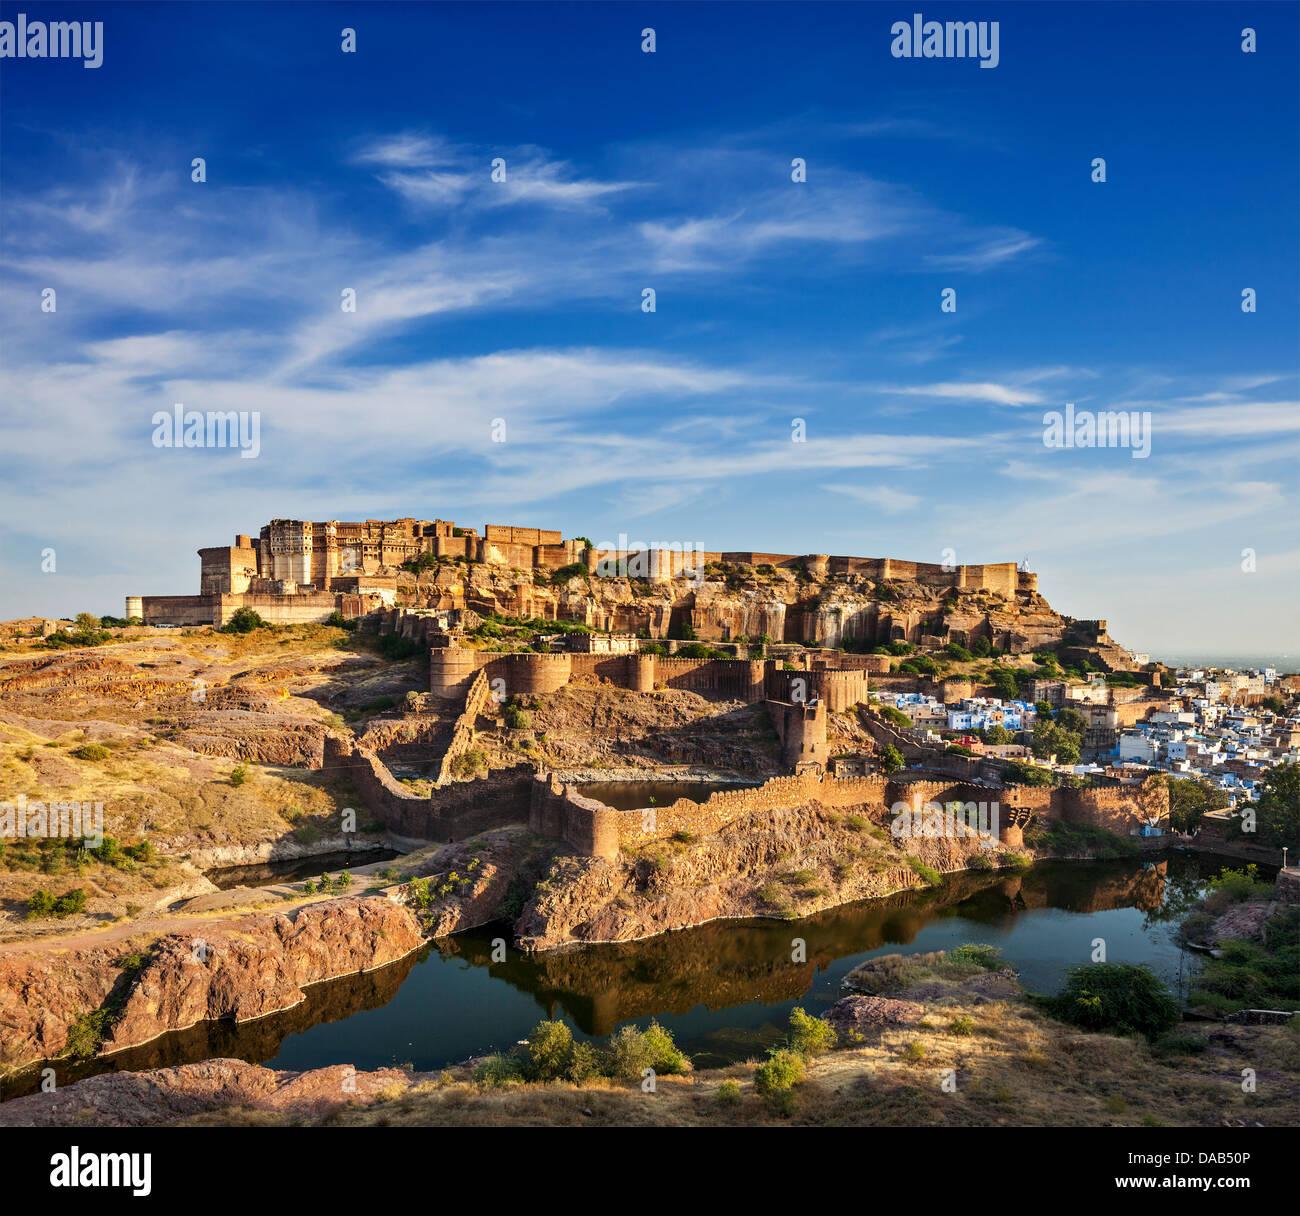 Mehrangarh Fort and Padamsar Talab and Ranisar Talab lakes, Jodhpur, Rajasthan, India - Stock Image